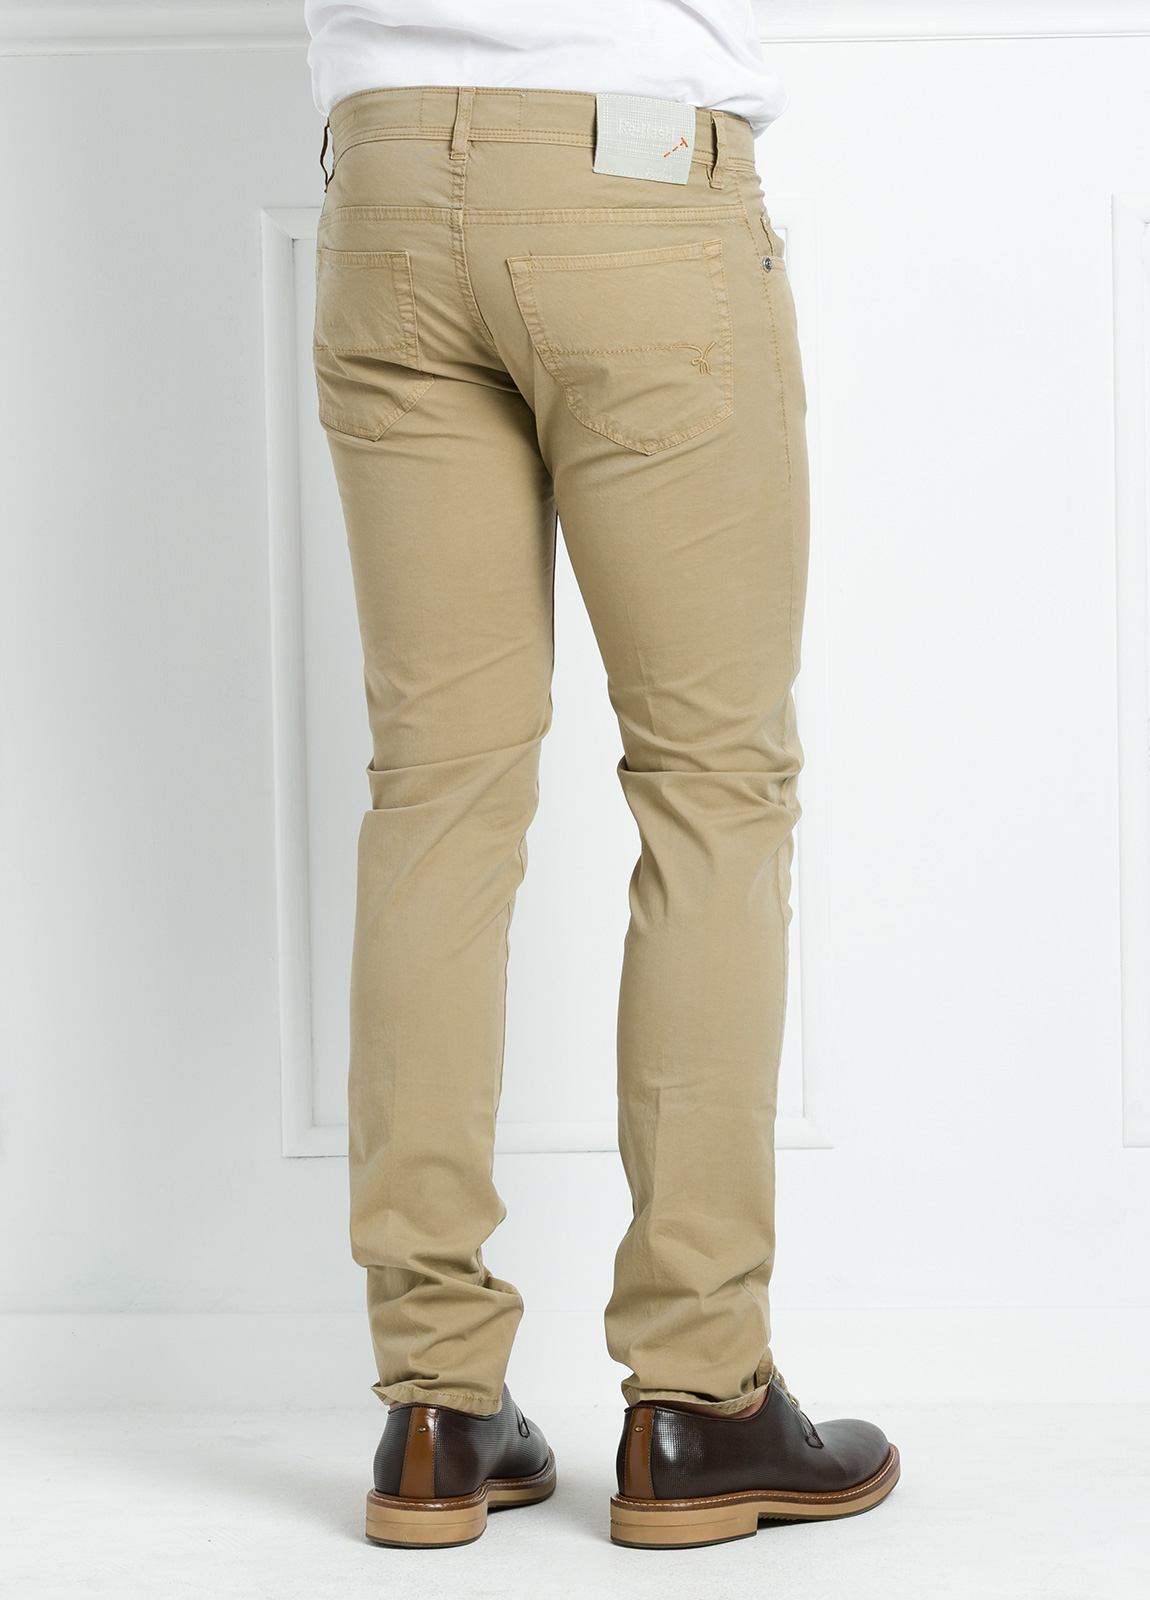 Pantalón sport regular fit modelo POLLOCK P 053 color beige. 96% Algodón gabardina 4% Lycra. - Ítem3